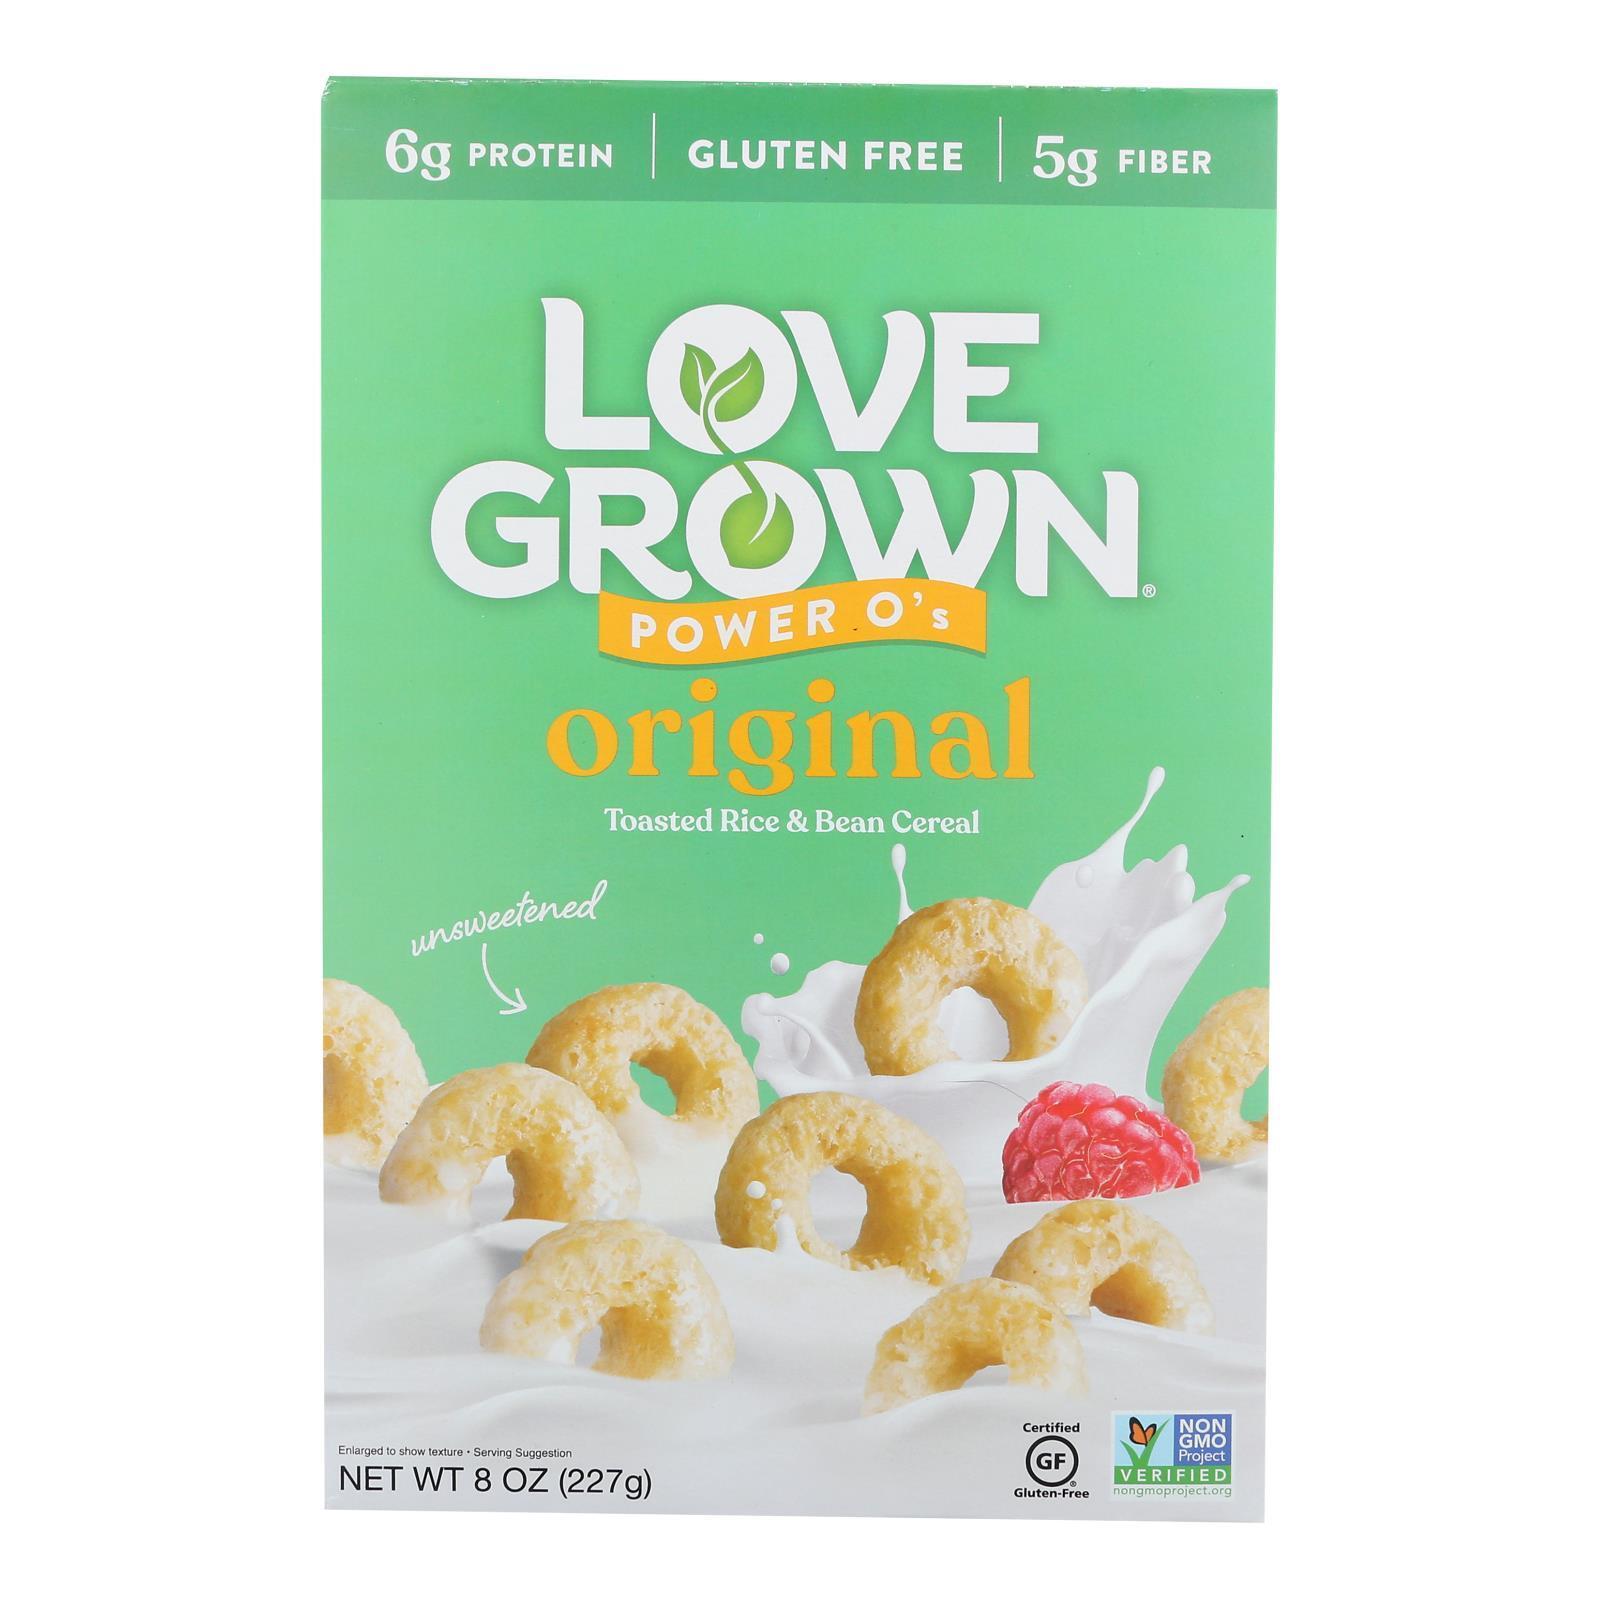 Love Grown Foods Power O's Cereal - Original - Case of 6 - 8 oz.